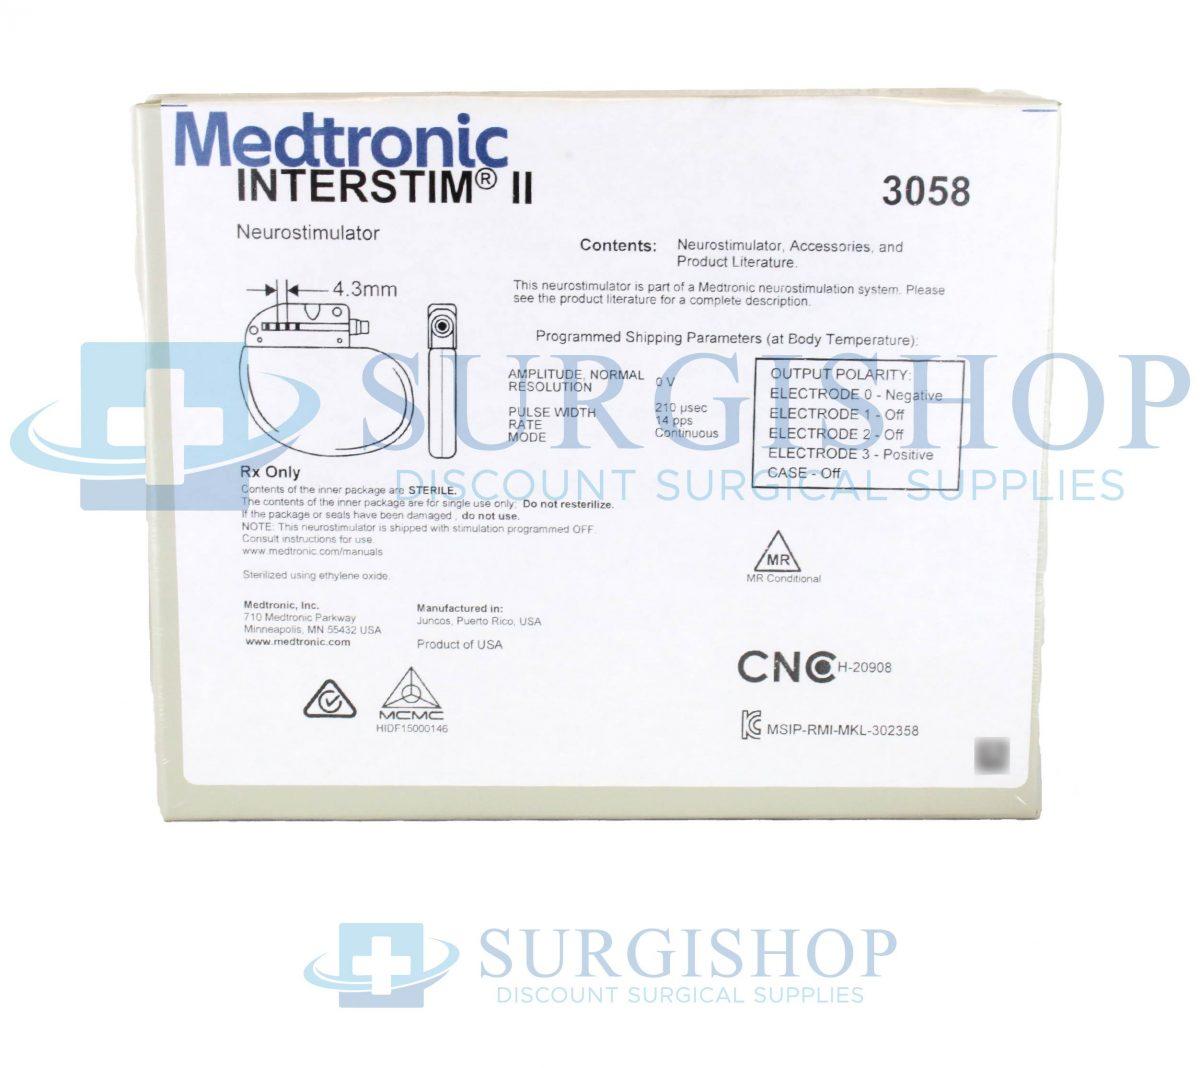 Medtronic Interstim II Neurostimulator